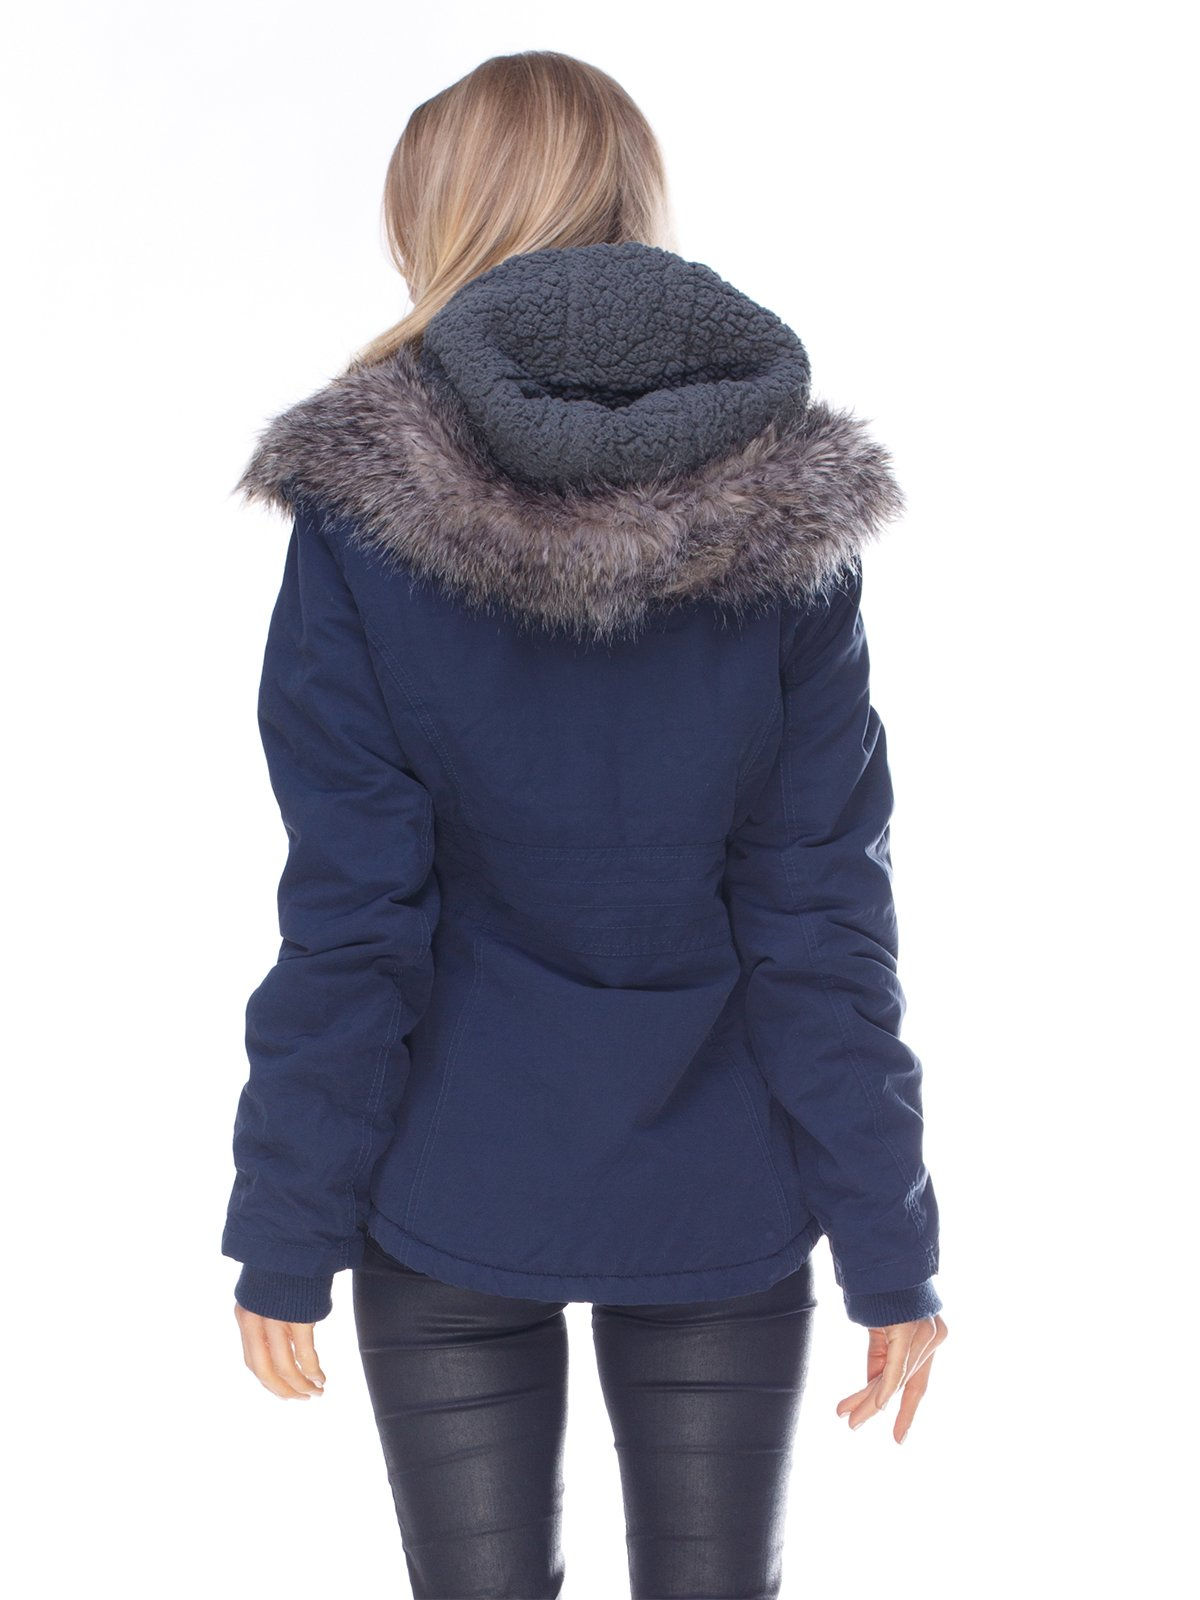 Куртка темно-синяя | 3166979 | фото 2